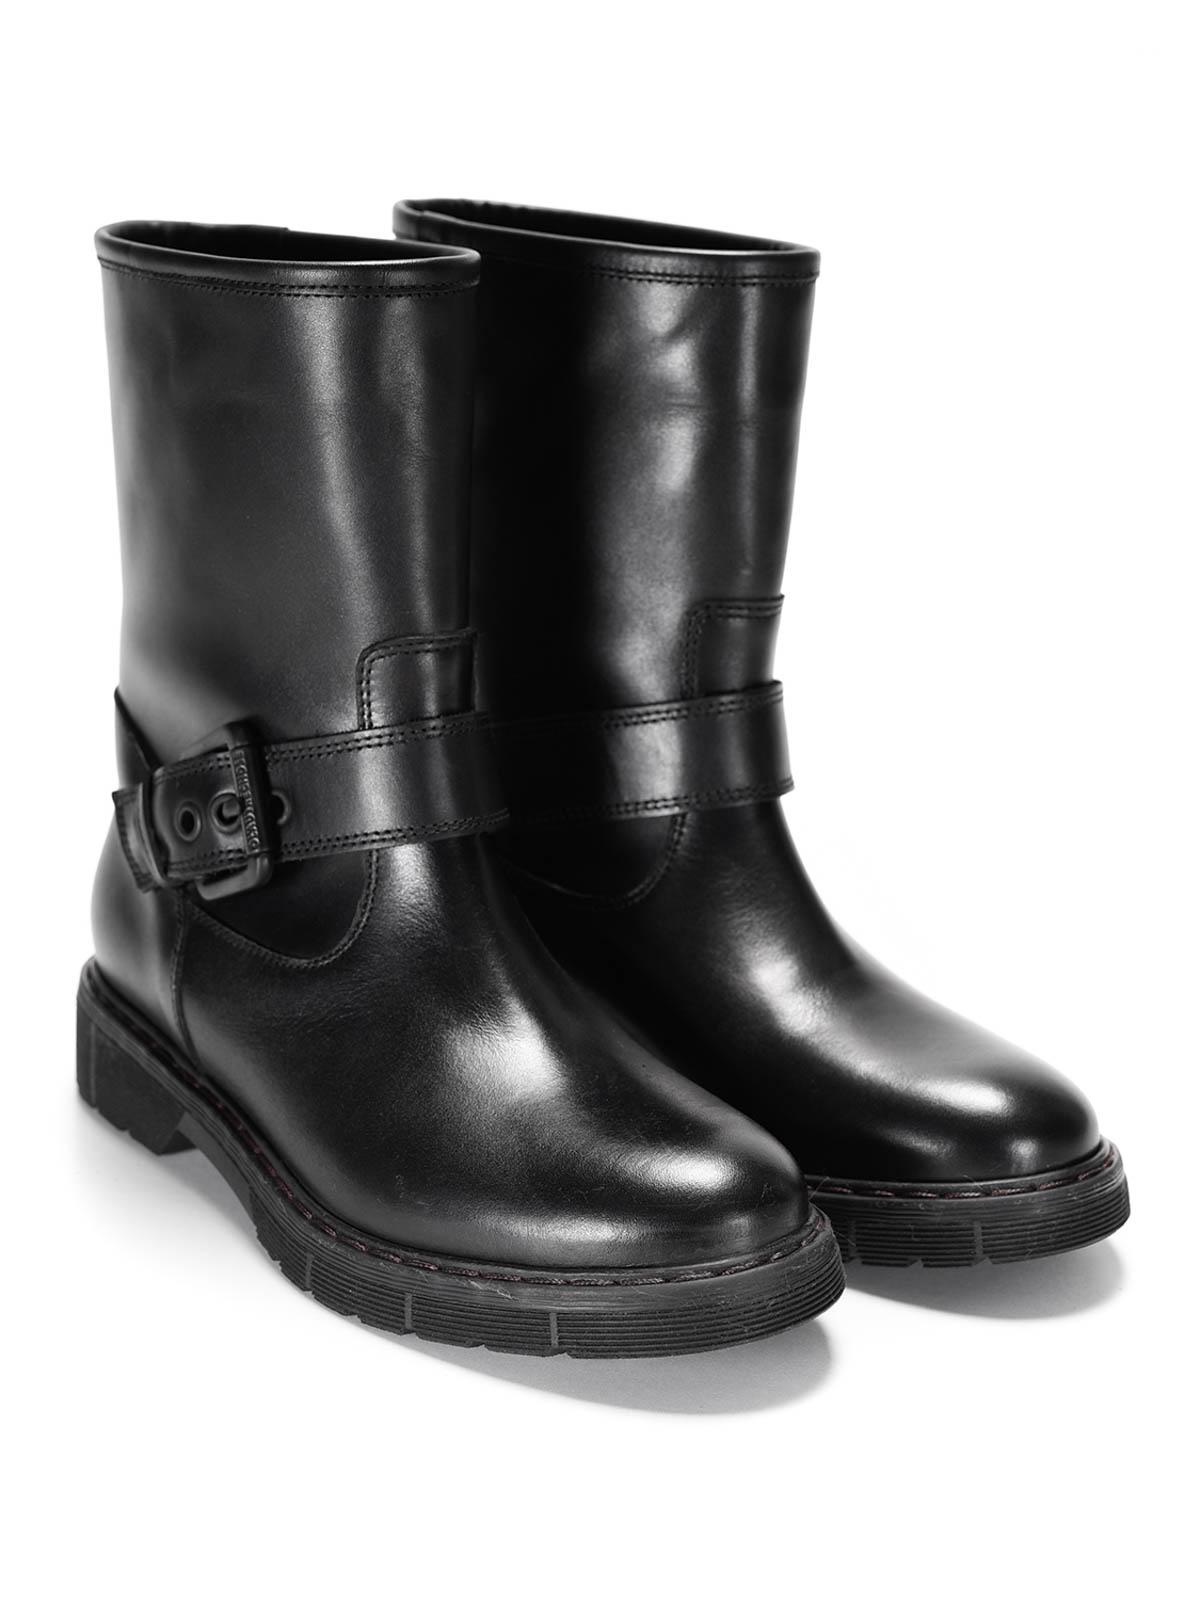 l 39 autre chose leather buckle ankle boots ankle boots. Black Bedroom Furniture Sets. Home Design Ideas